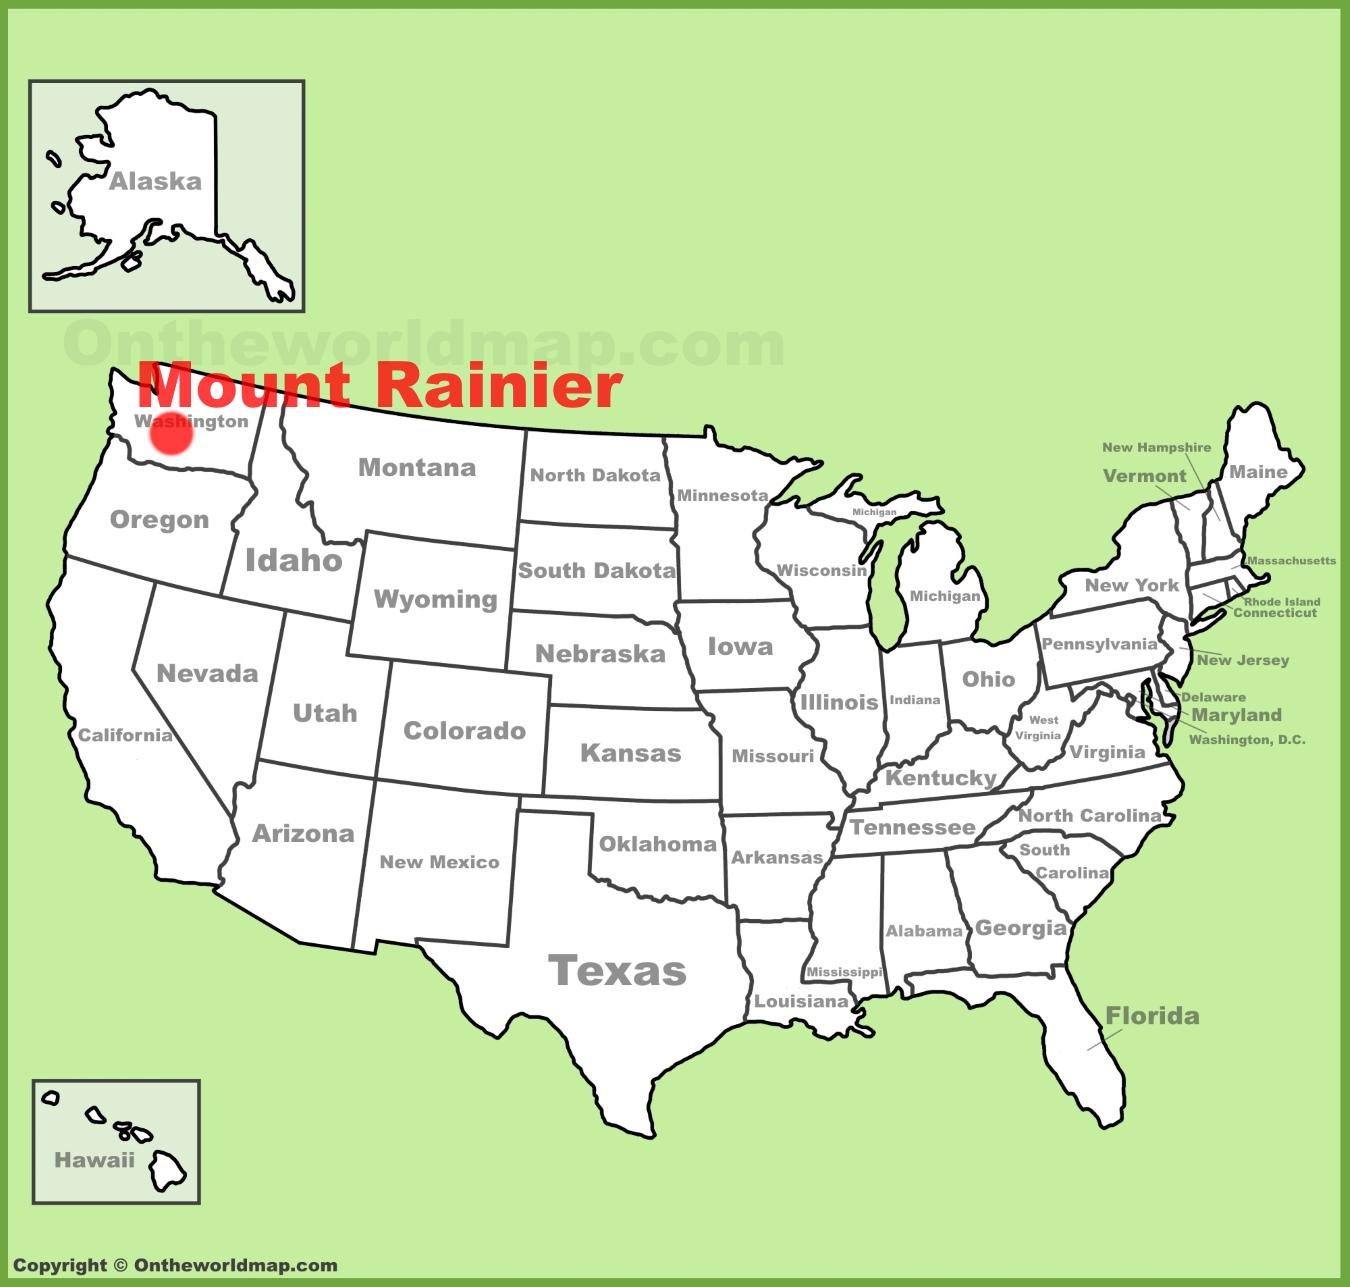 Mount Rainier Map Mount Rainier Maps | USA | Maps of Mount Rainier National Park